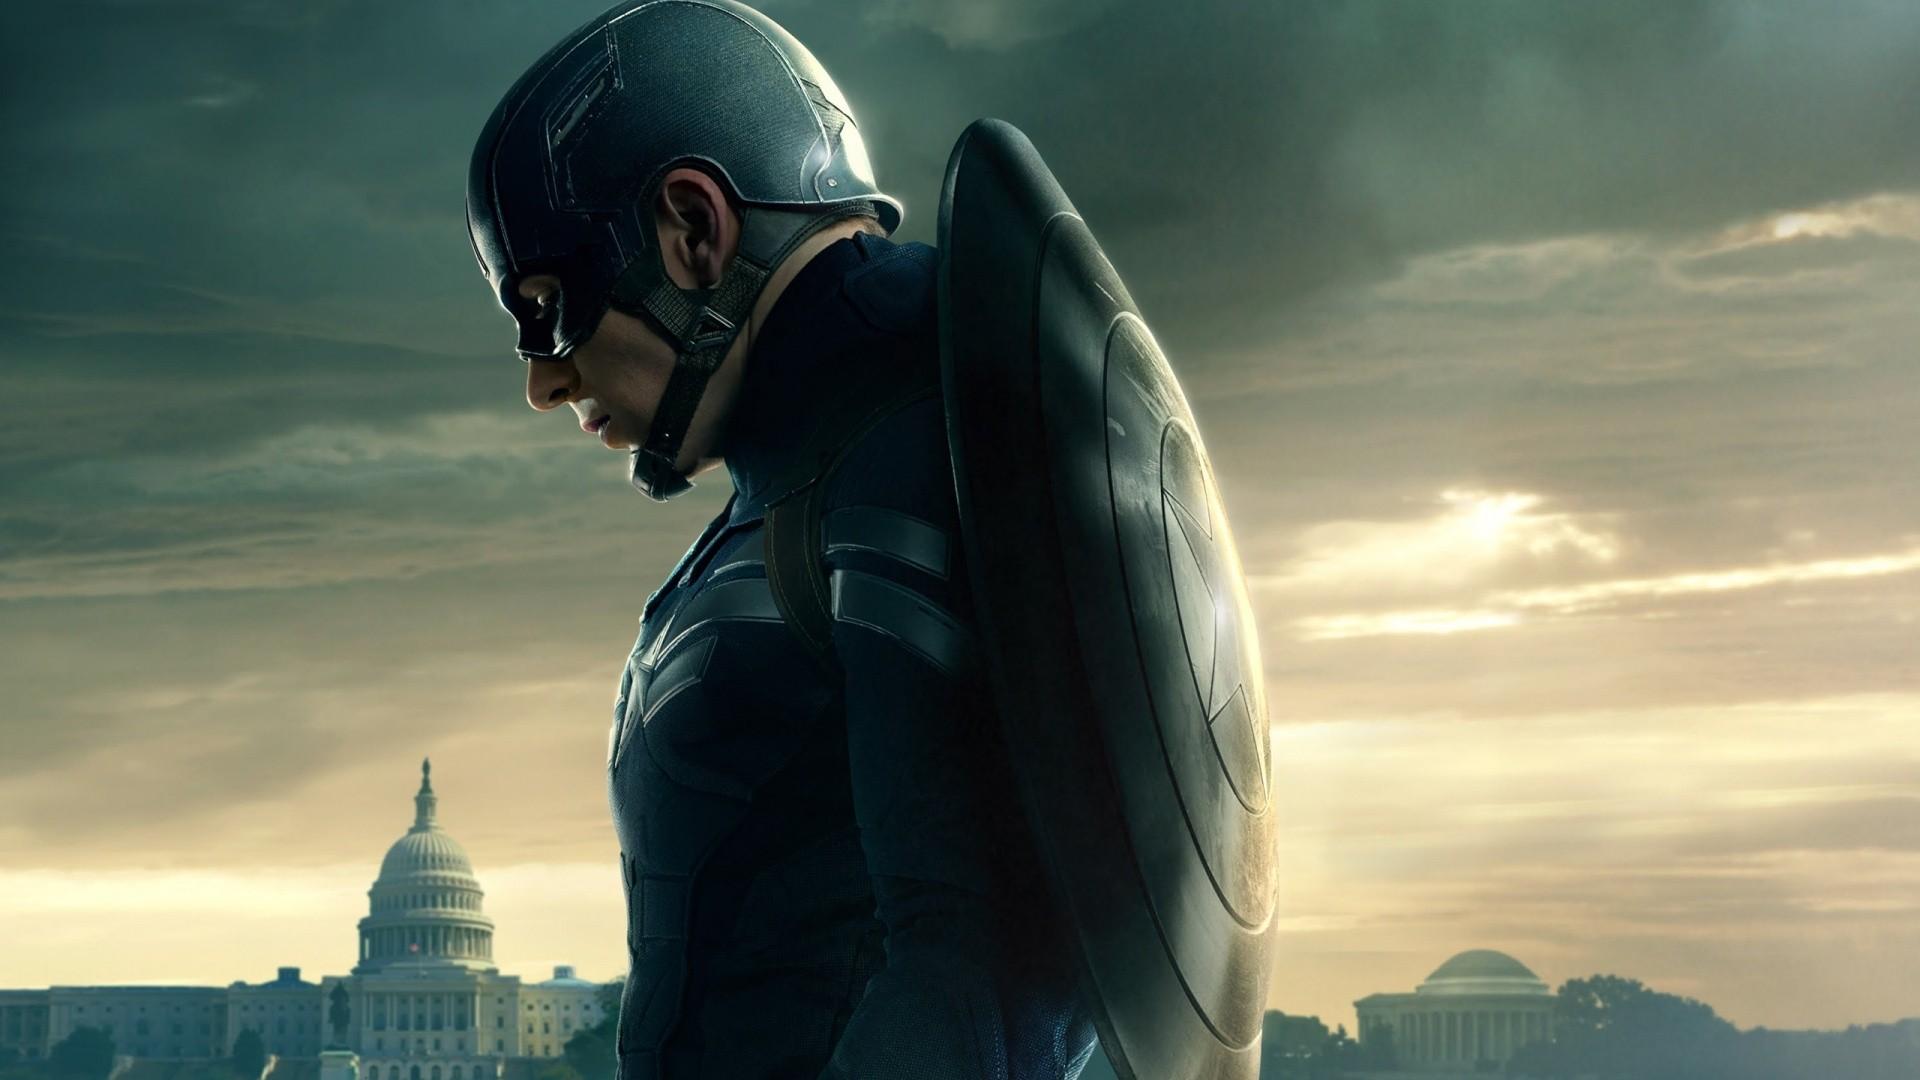 Captain America HD Desktop Wallpaper